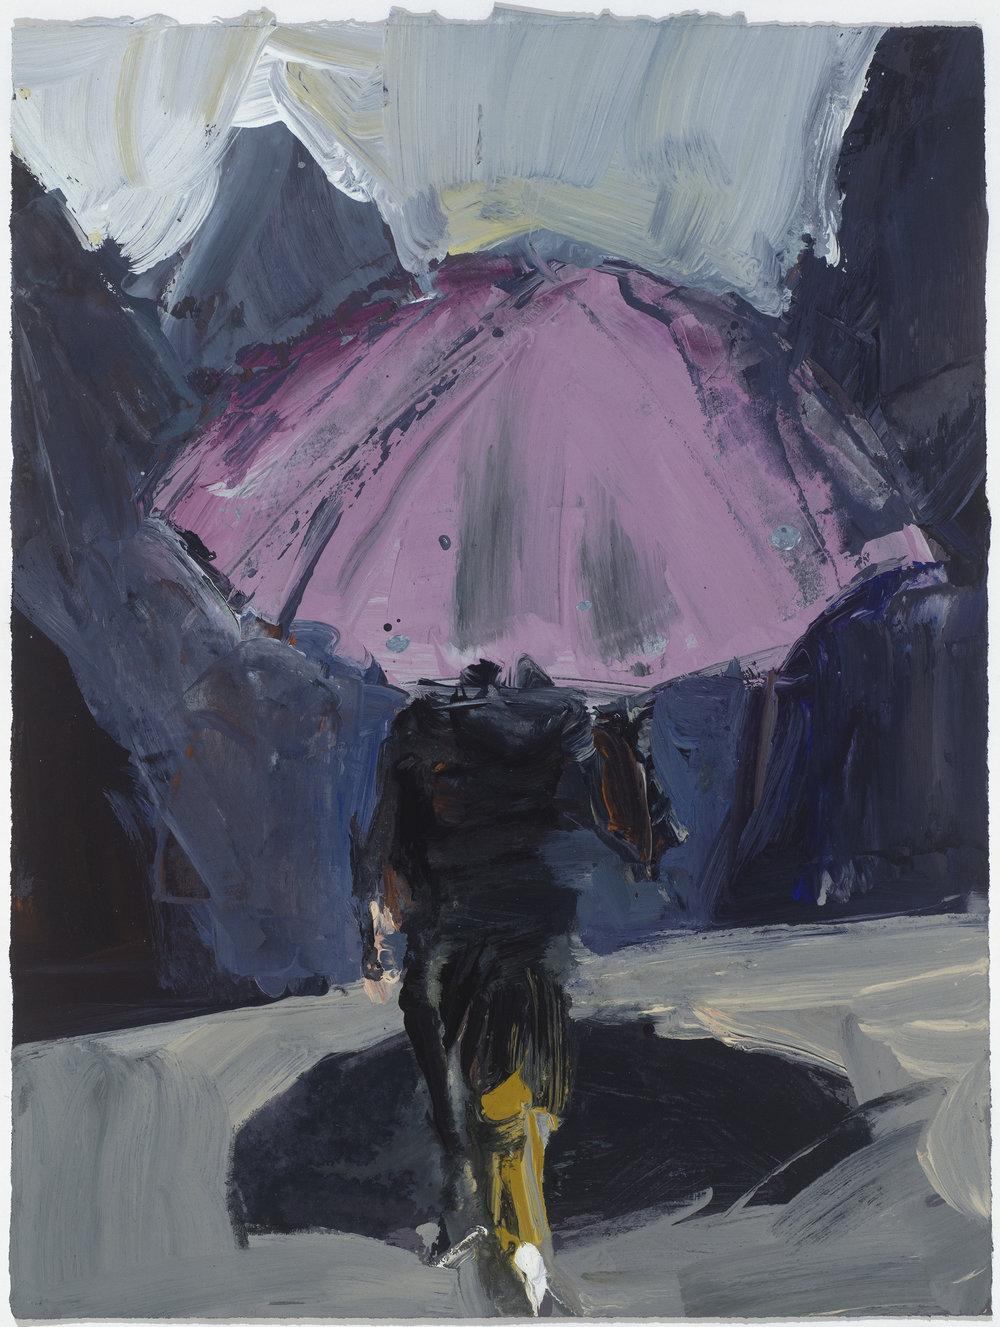 Pink umbrella 10/16  粉紅的傘10/16   Euan Macleod , 2016  Acrylic on paper, 40 x 30 cm, HKD 9,800 framed